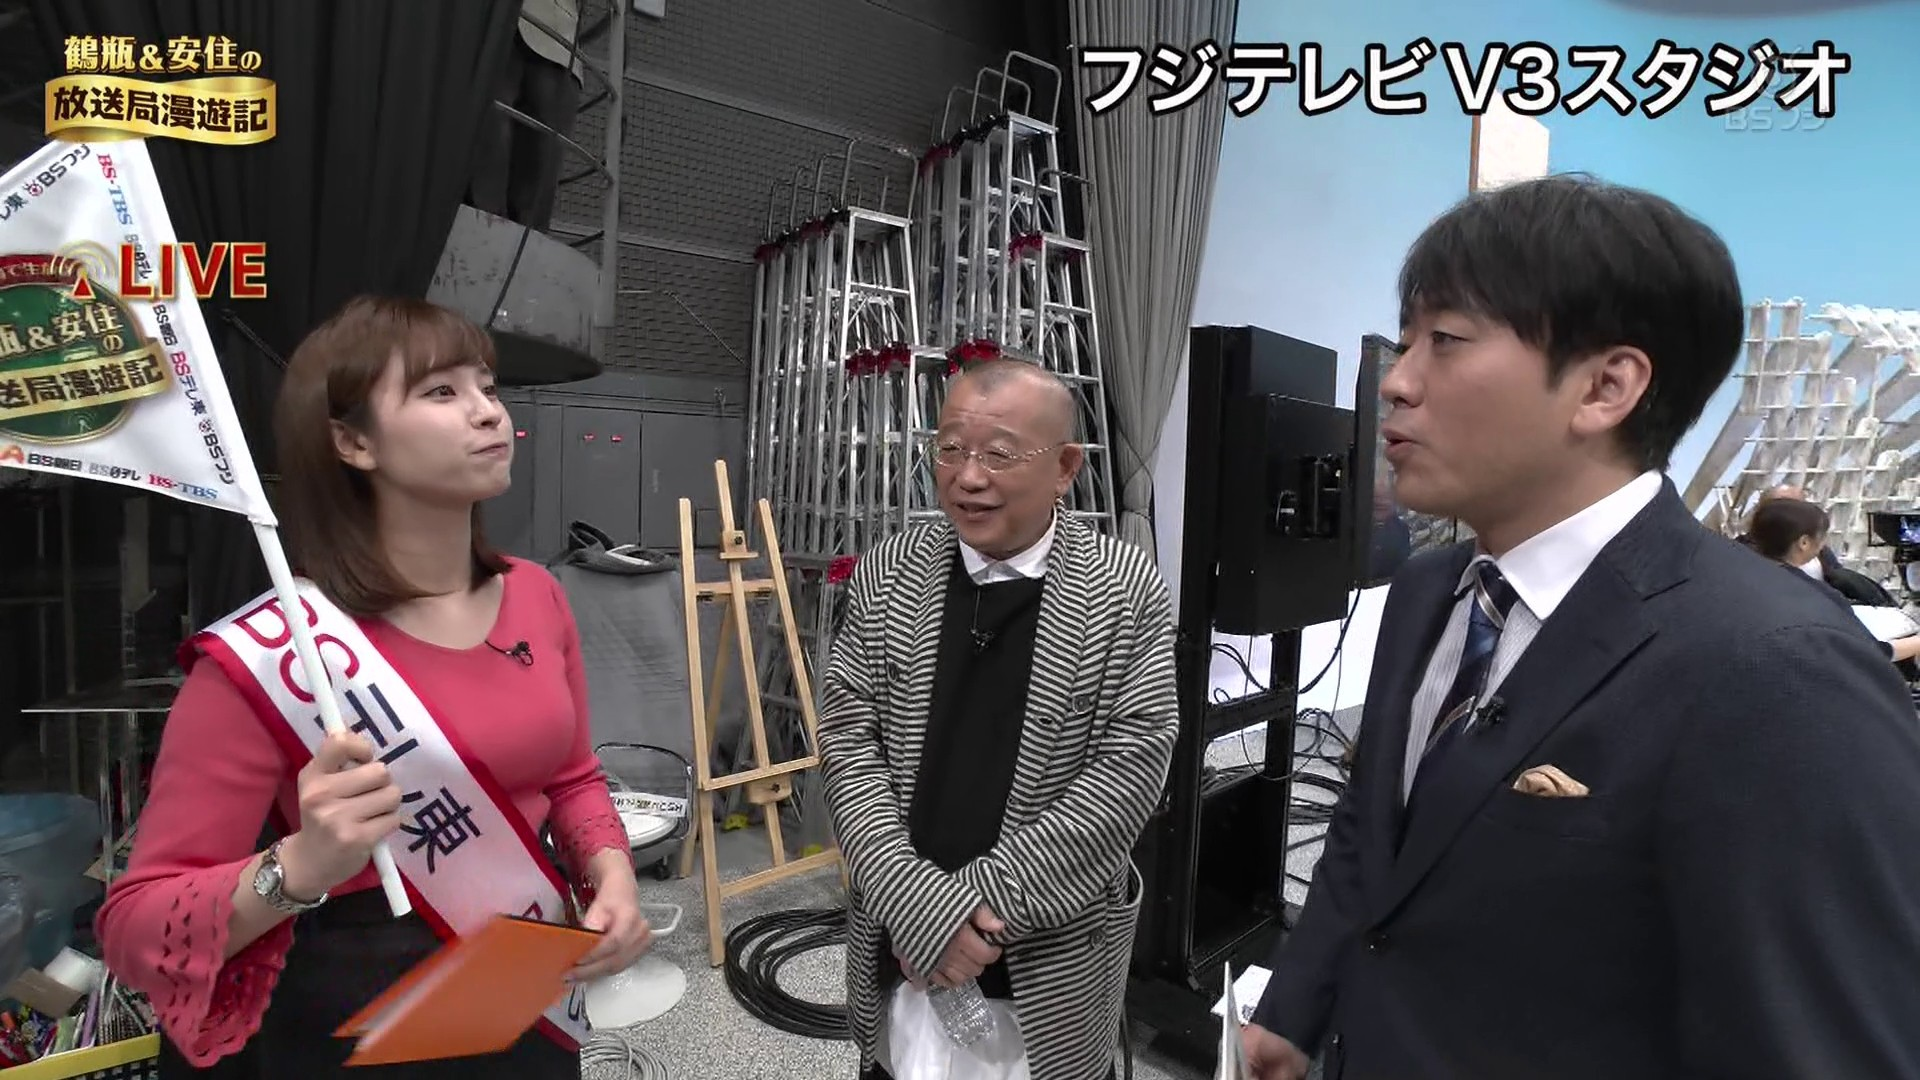 角谷暁子_女子アナ_着衣巨乳_鶴瓶&安住の放送局漫遊記_04